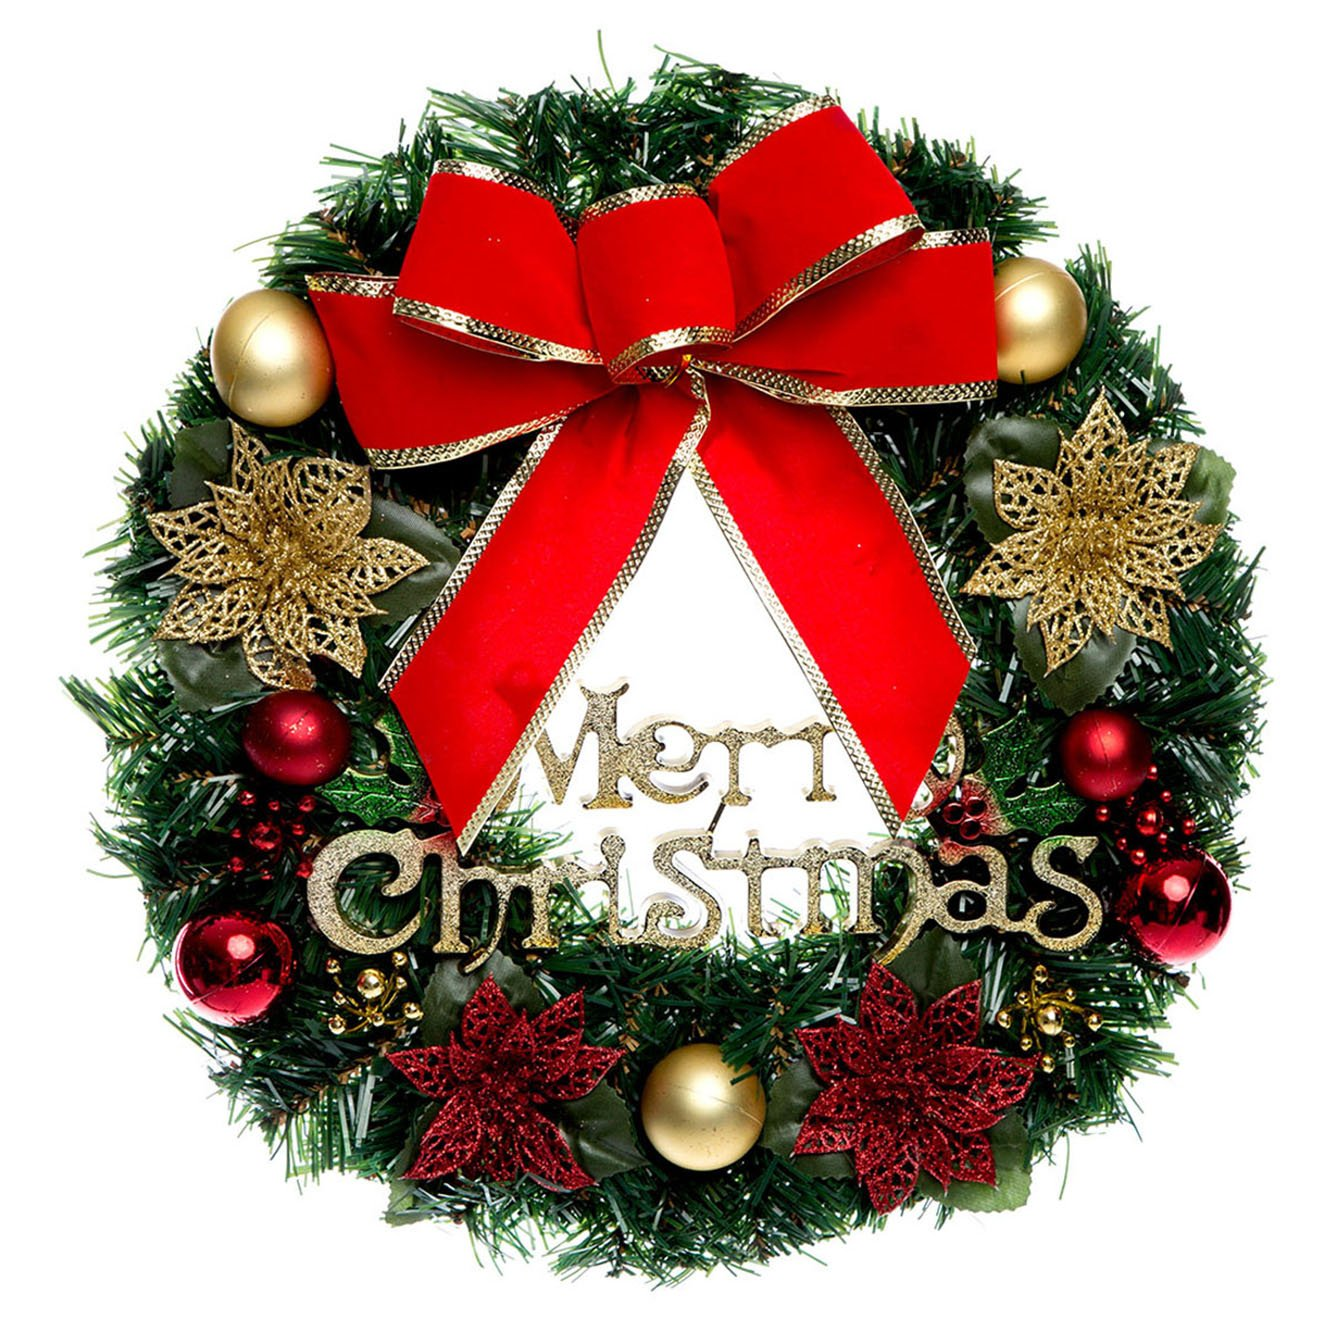 Amazon.com: SOMOYA Christmas Wreath with Ribbon and Bells, Indoor ...